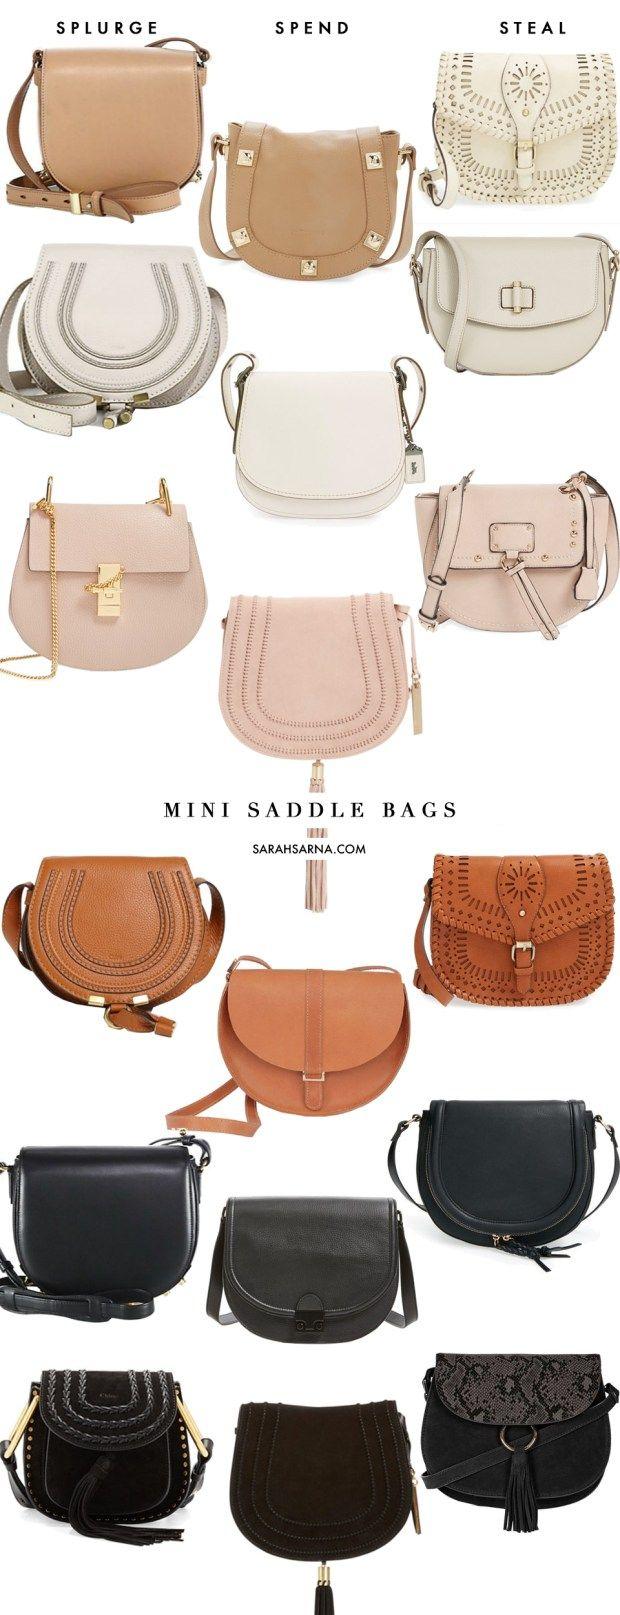 Spring Fashion: Mini Saddle Bags